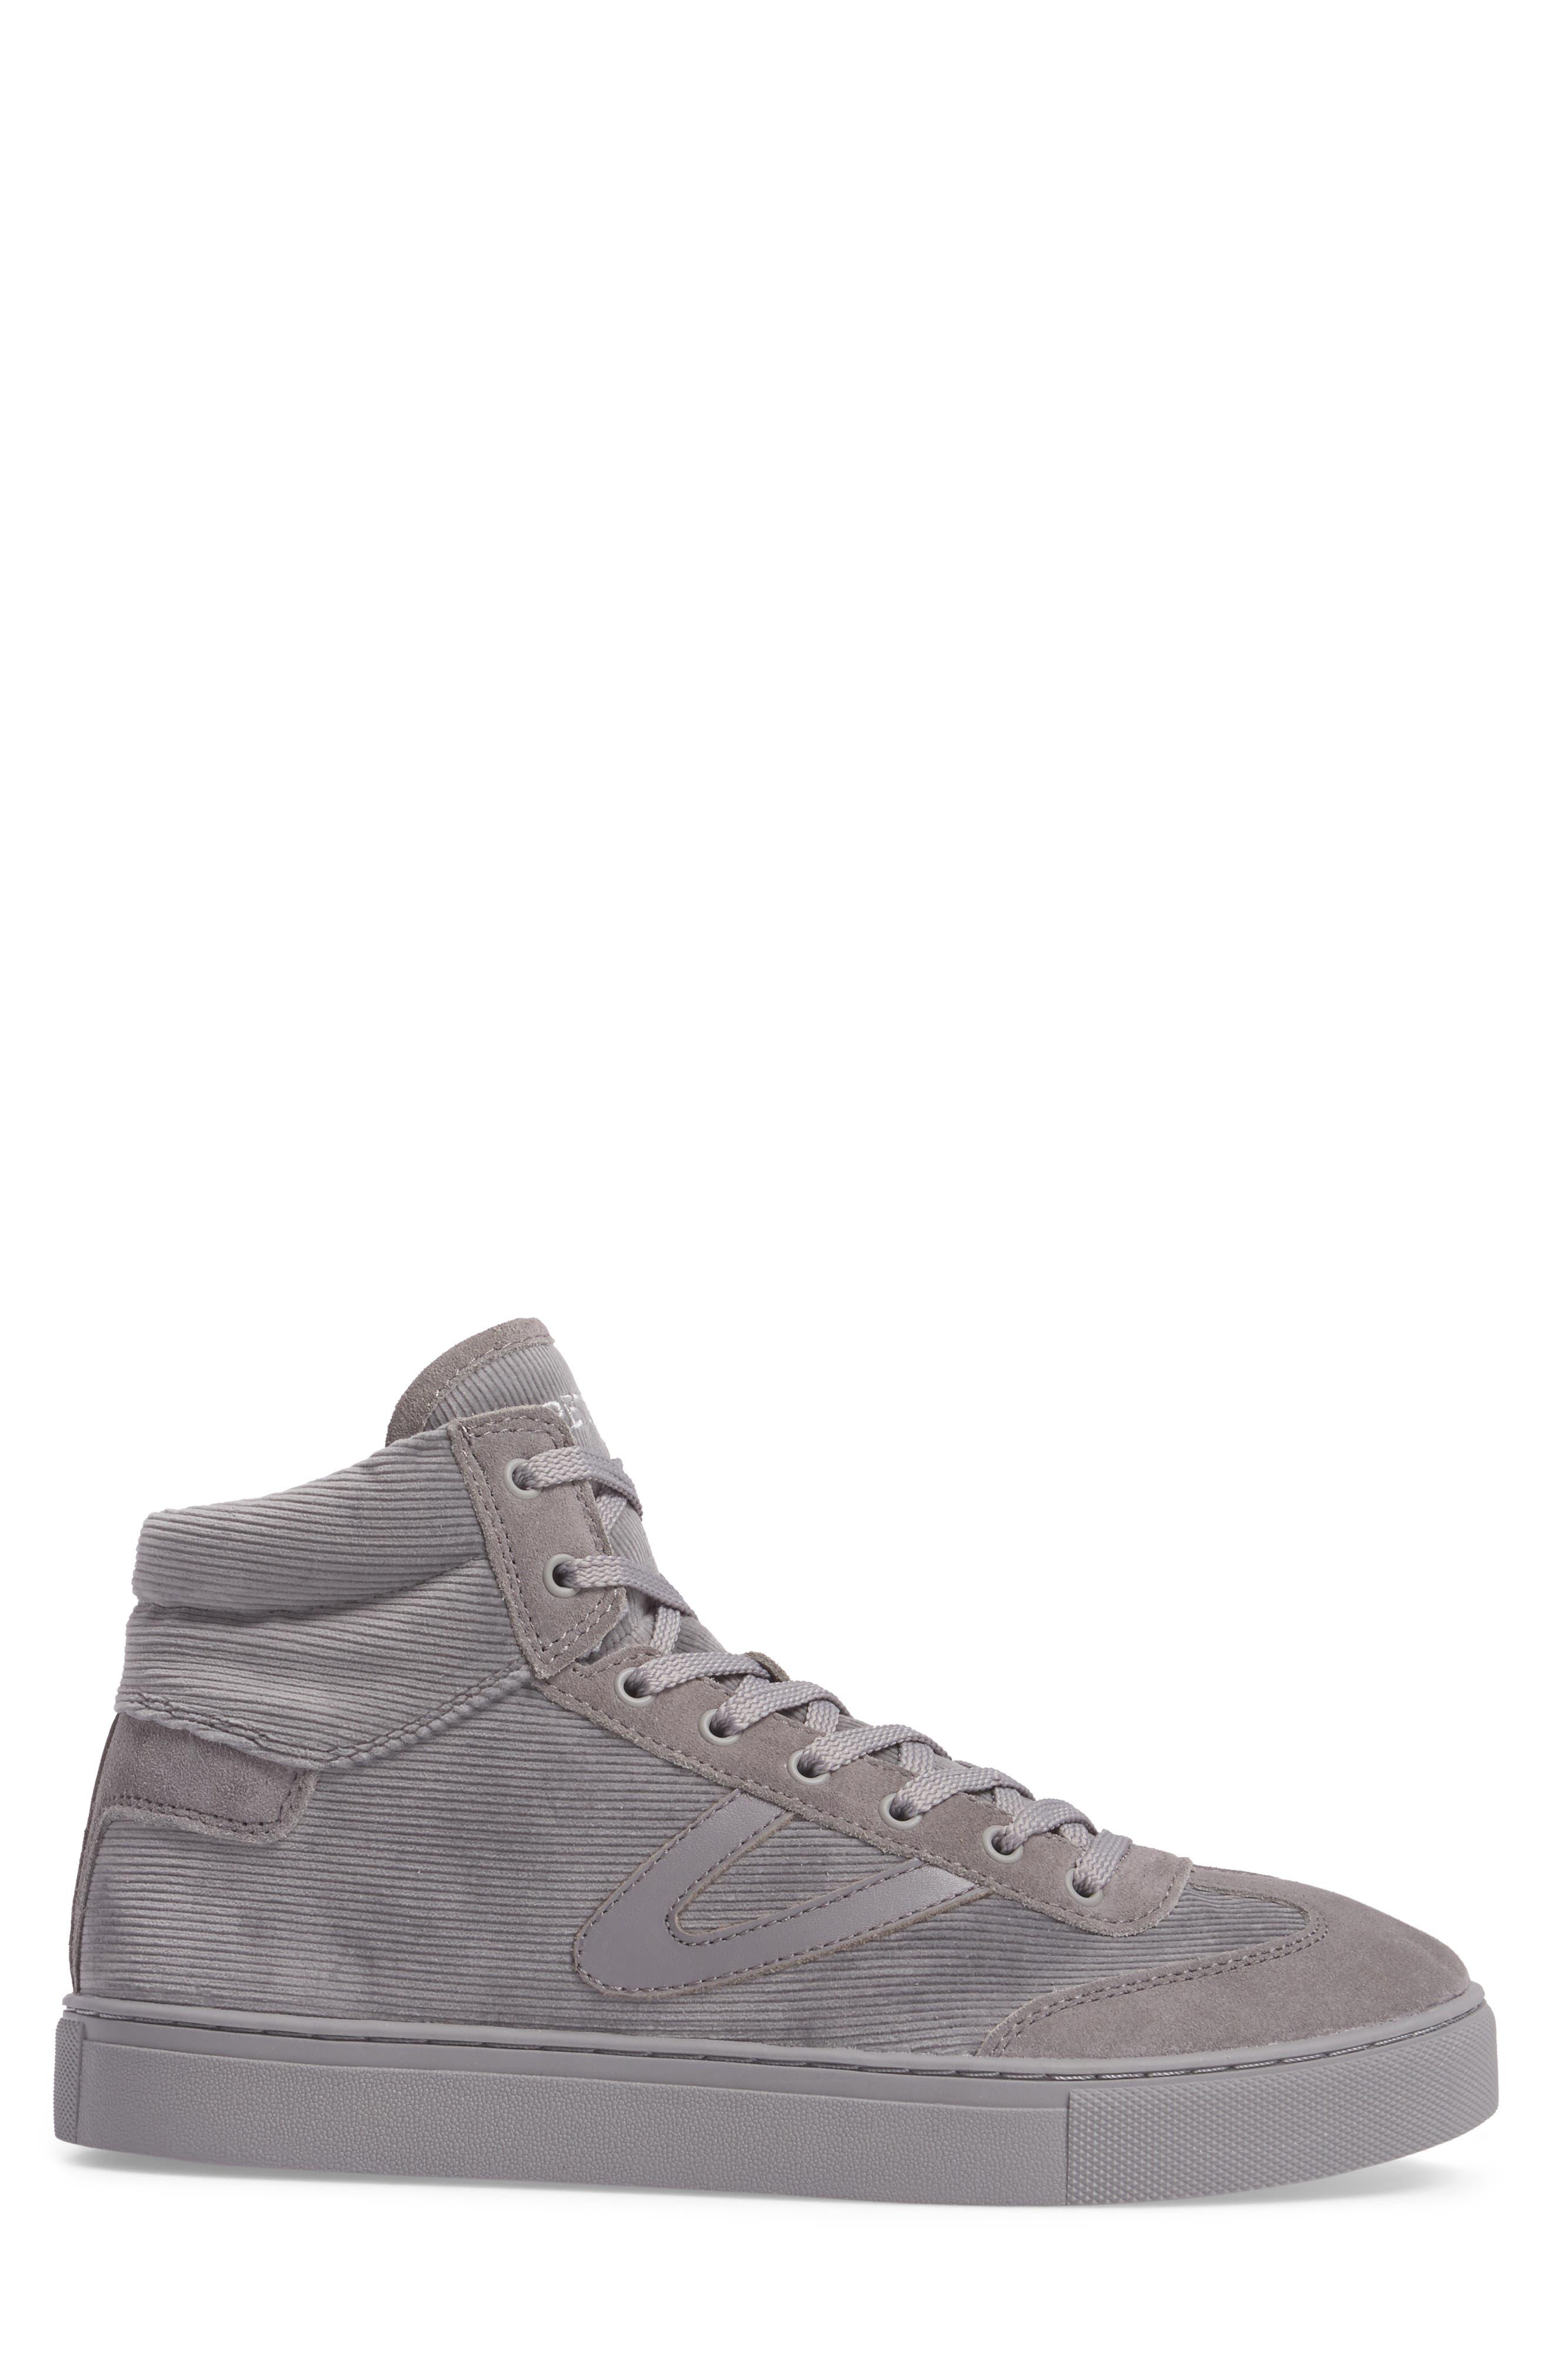 Jack High Top Sneaker,                             Alternate thumbnail 3, color,                             Grey/ Grey